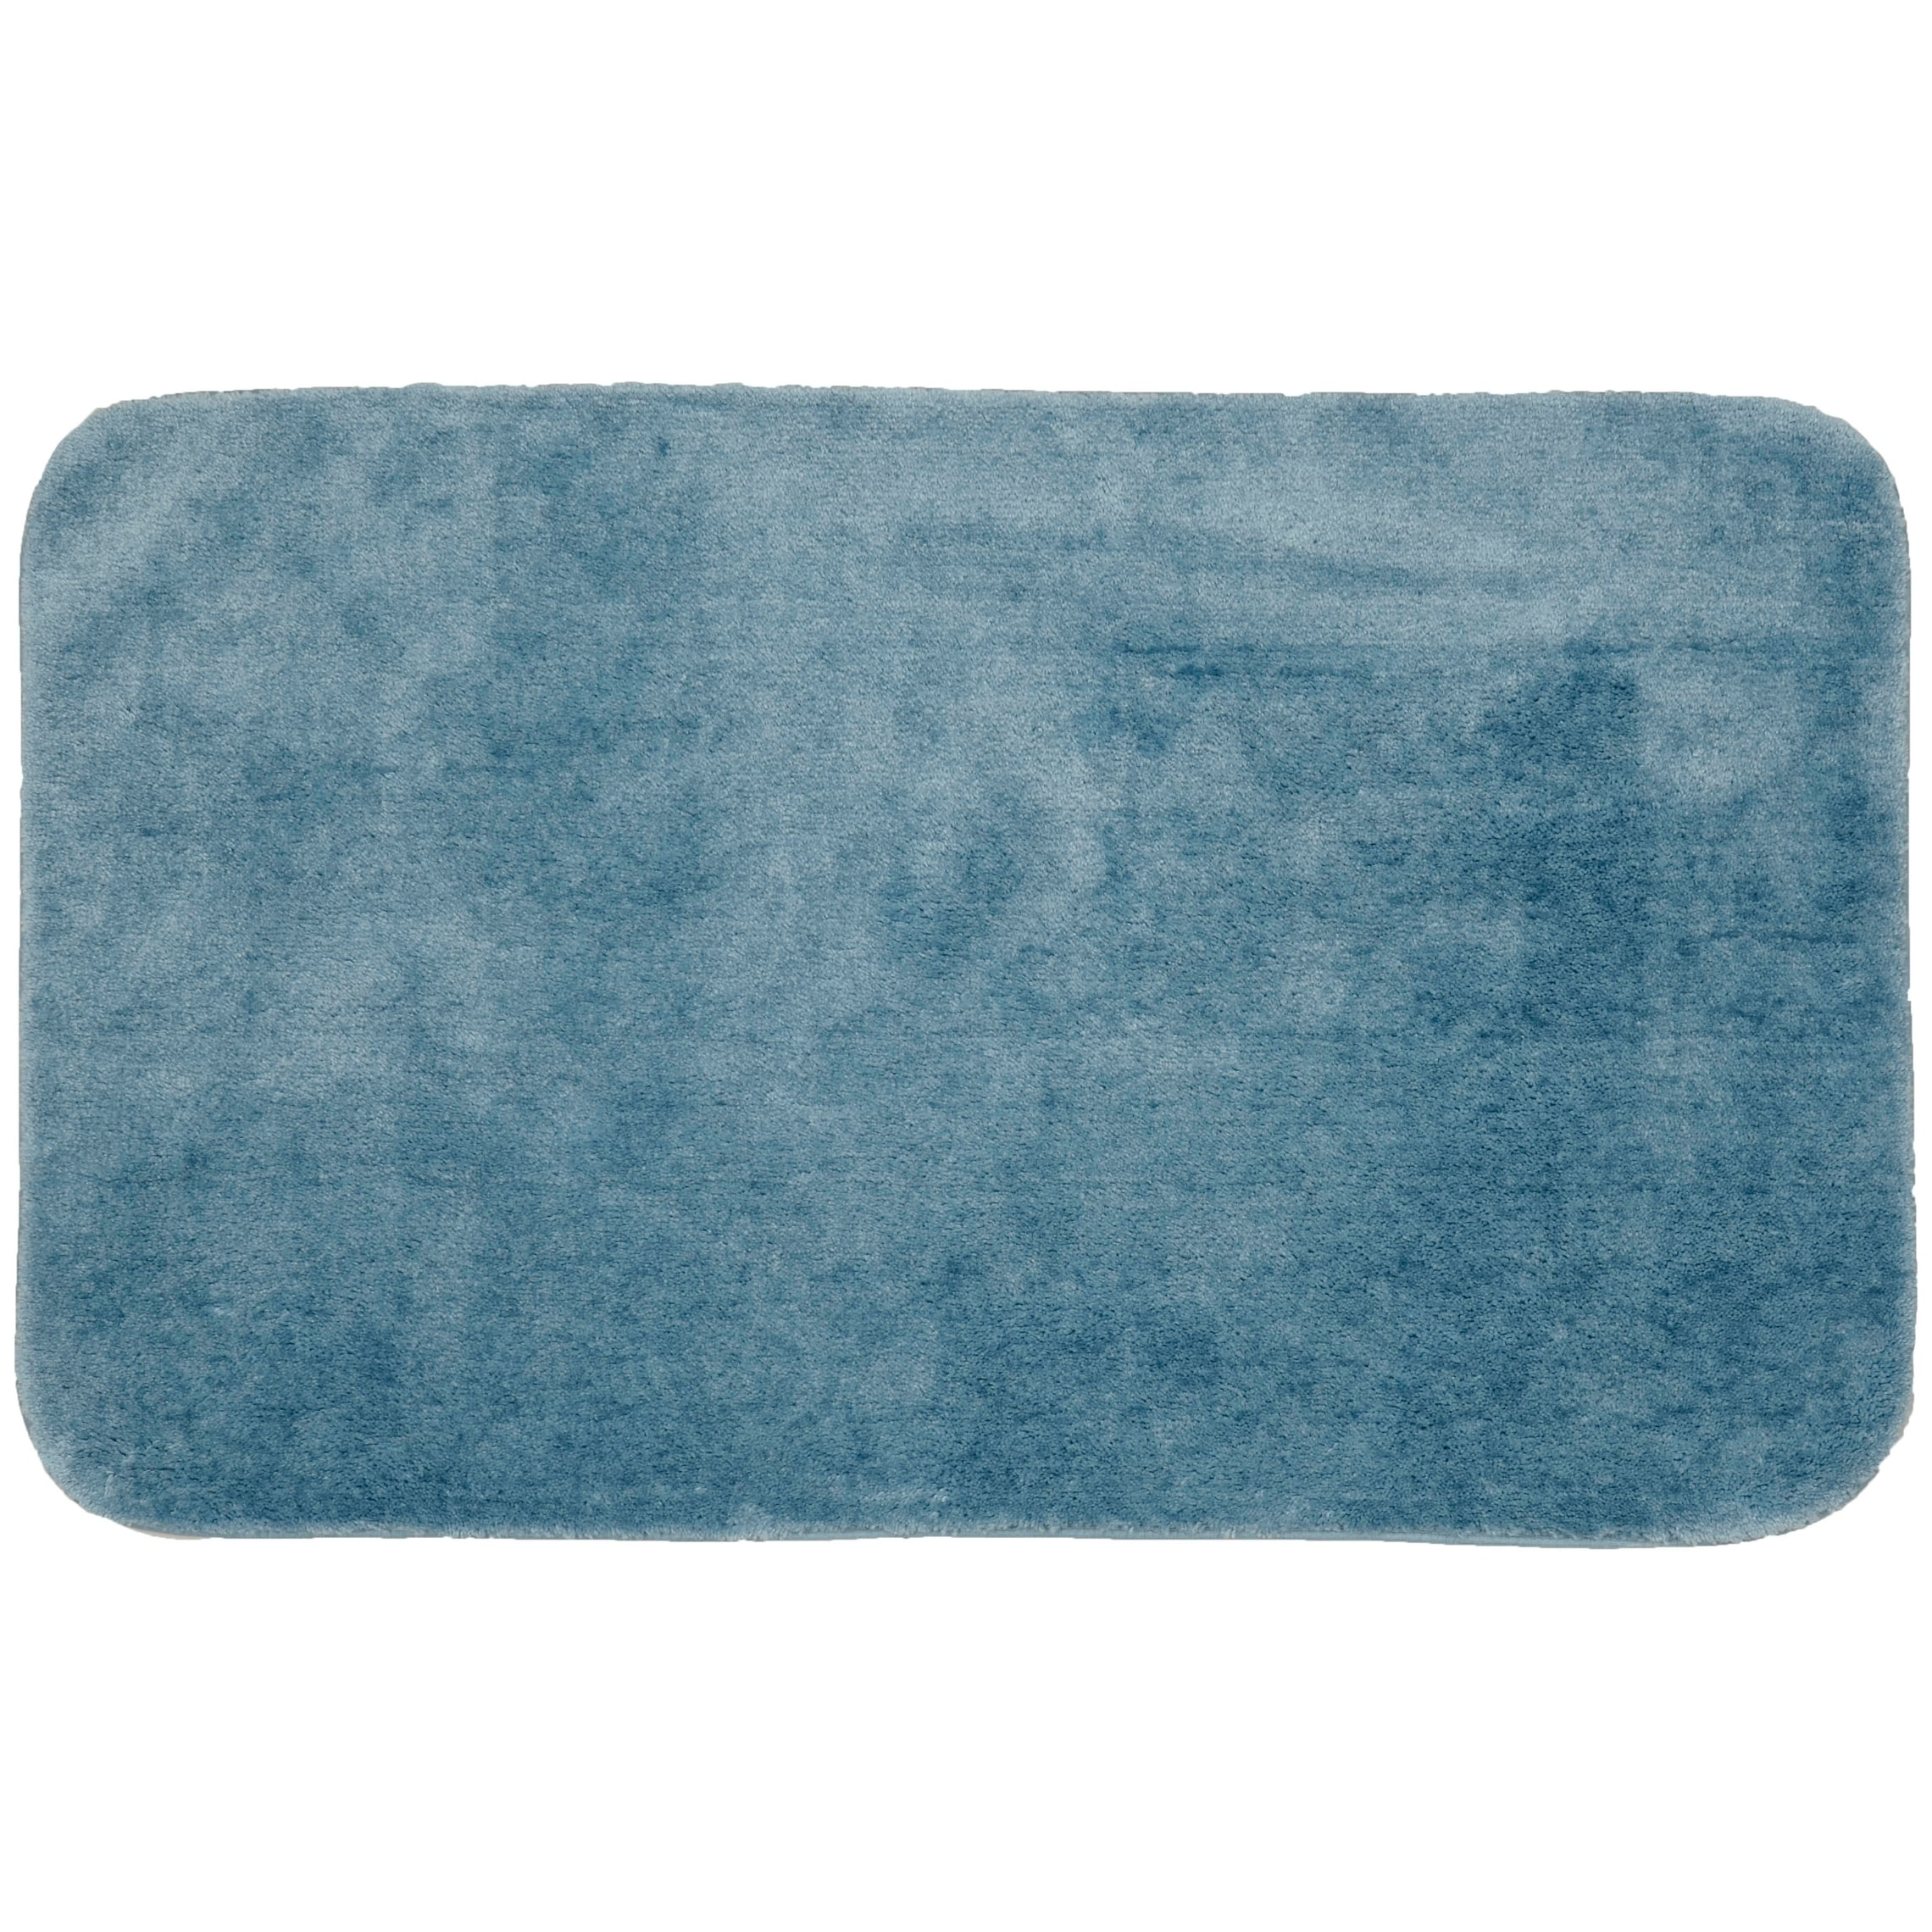 Traditional Plush Basin Blue Washable Nylon Bathroom Rug Runner Overstock 25719774 21 X 34 Lid Contour